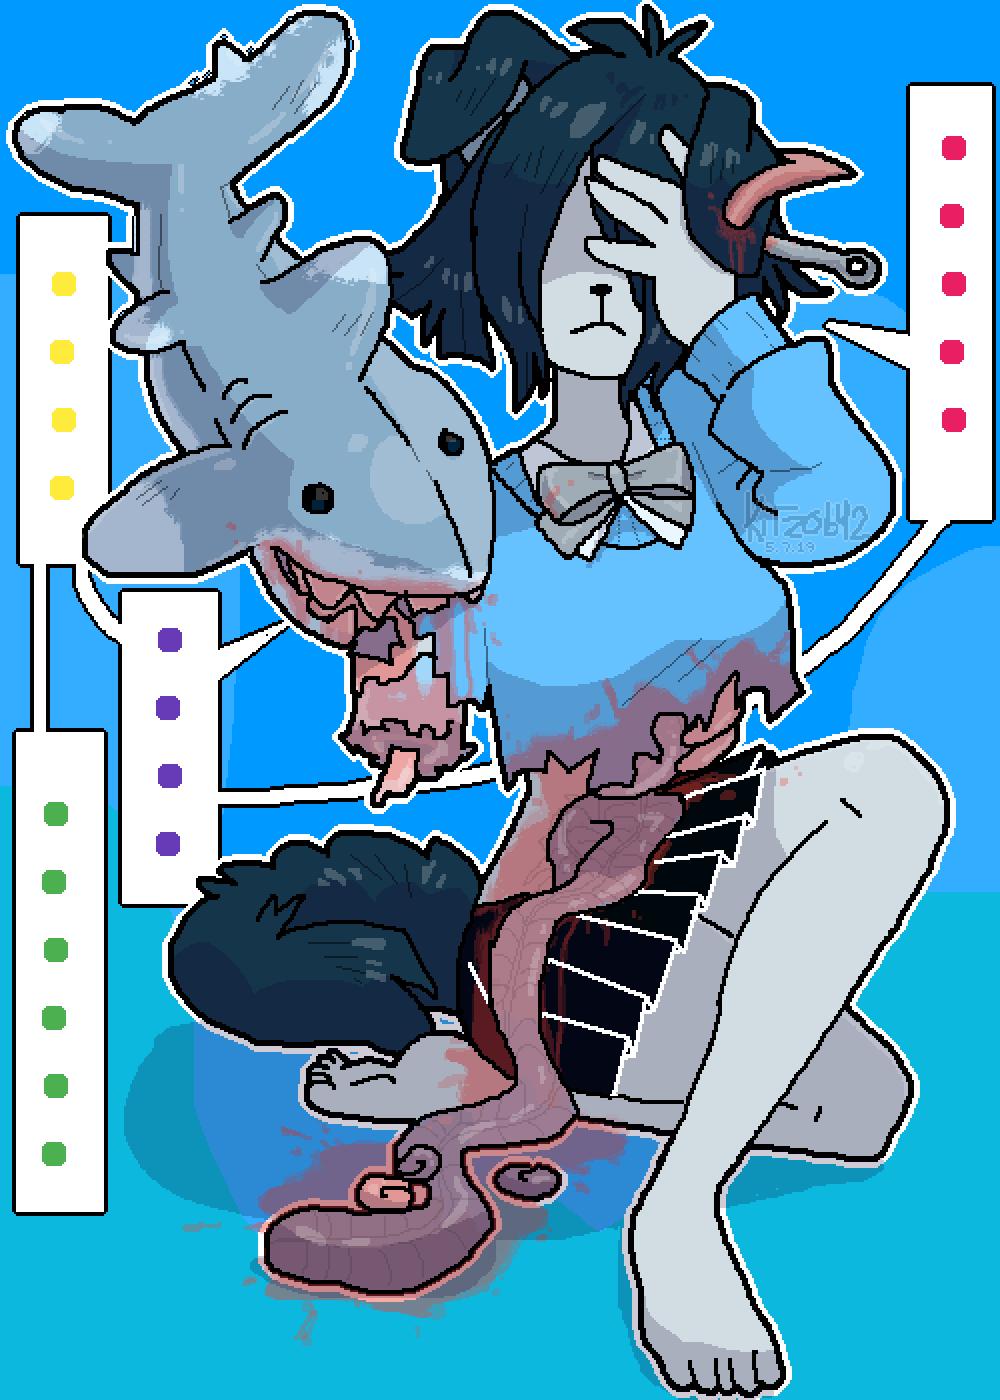 Shark attack by Kitzo642